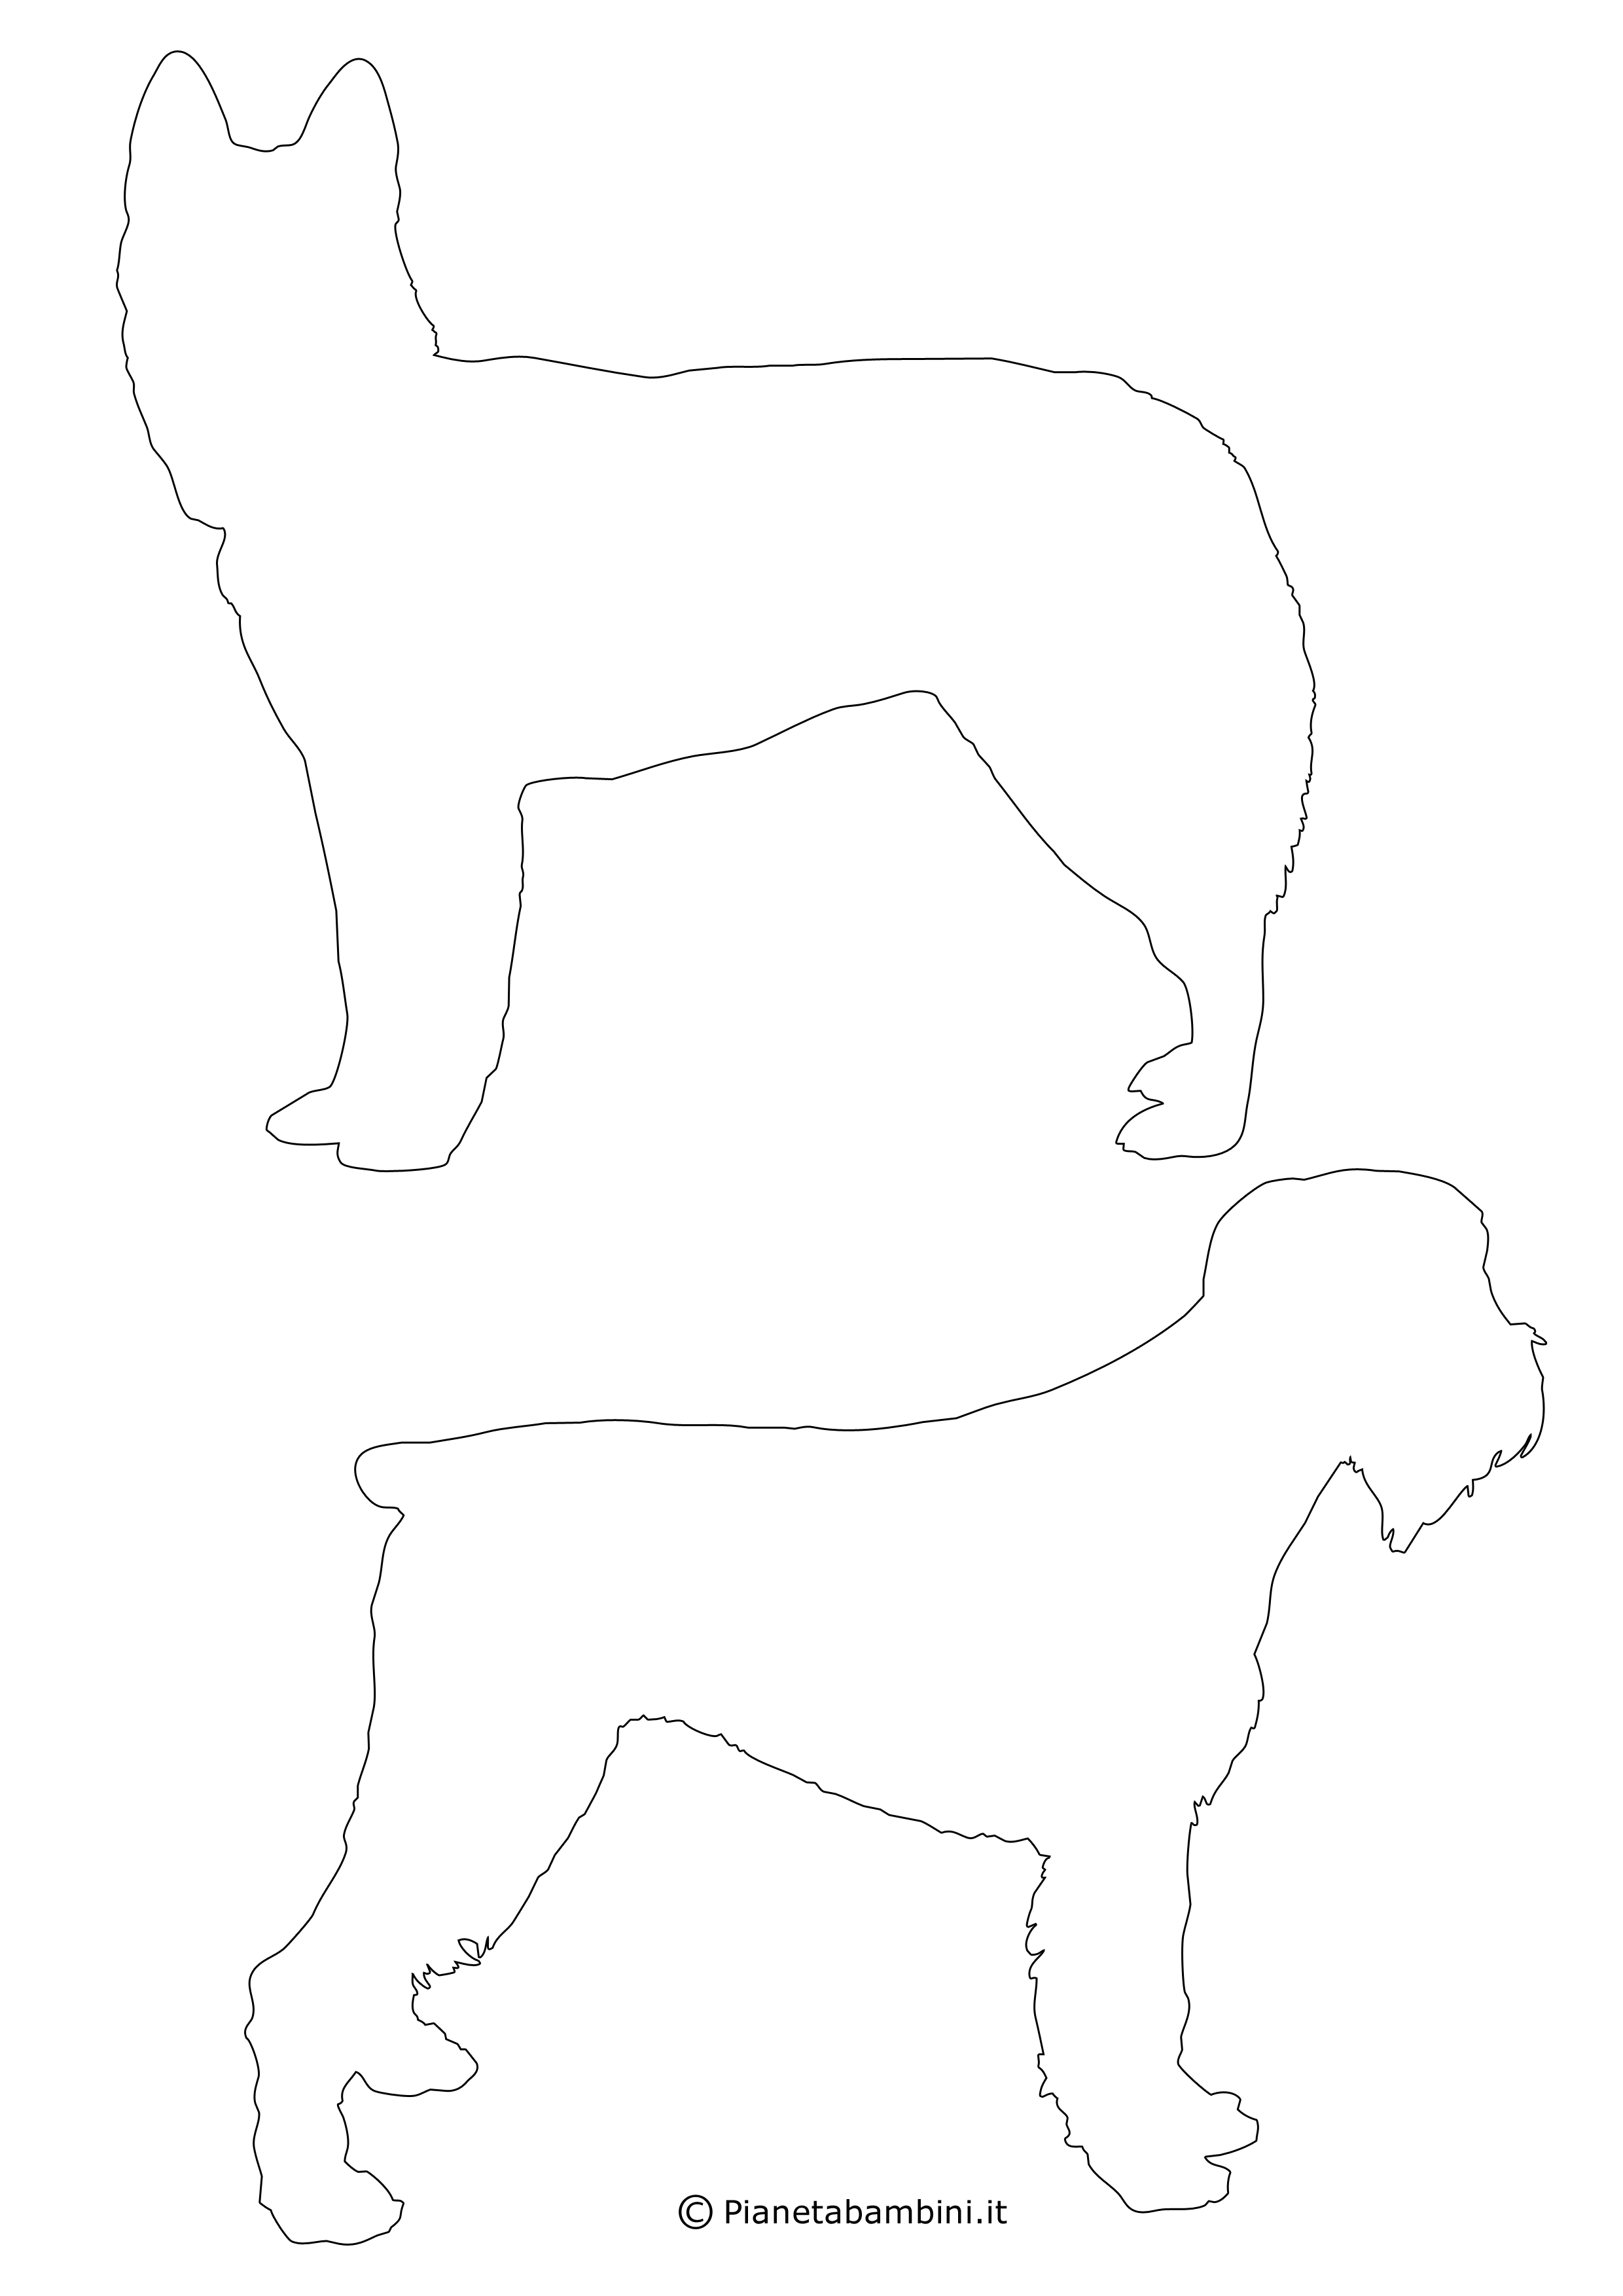 Sagome di cani medie da ritagliare 9